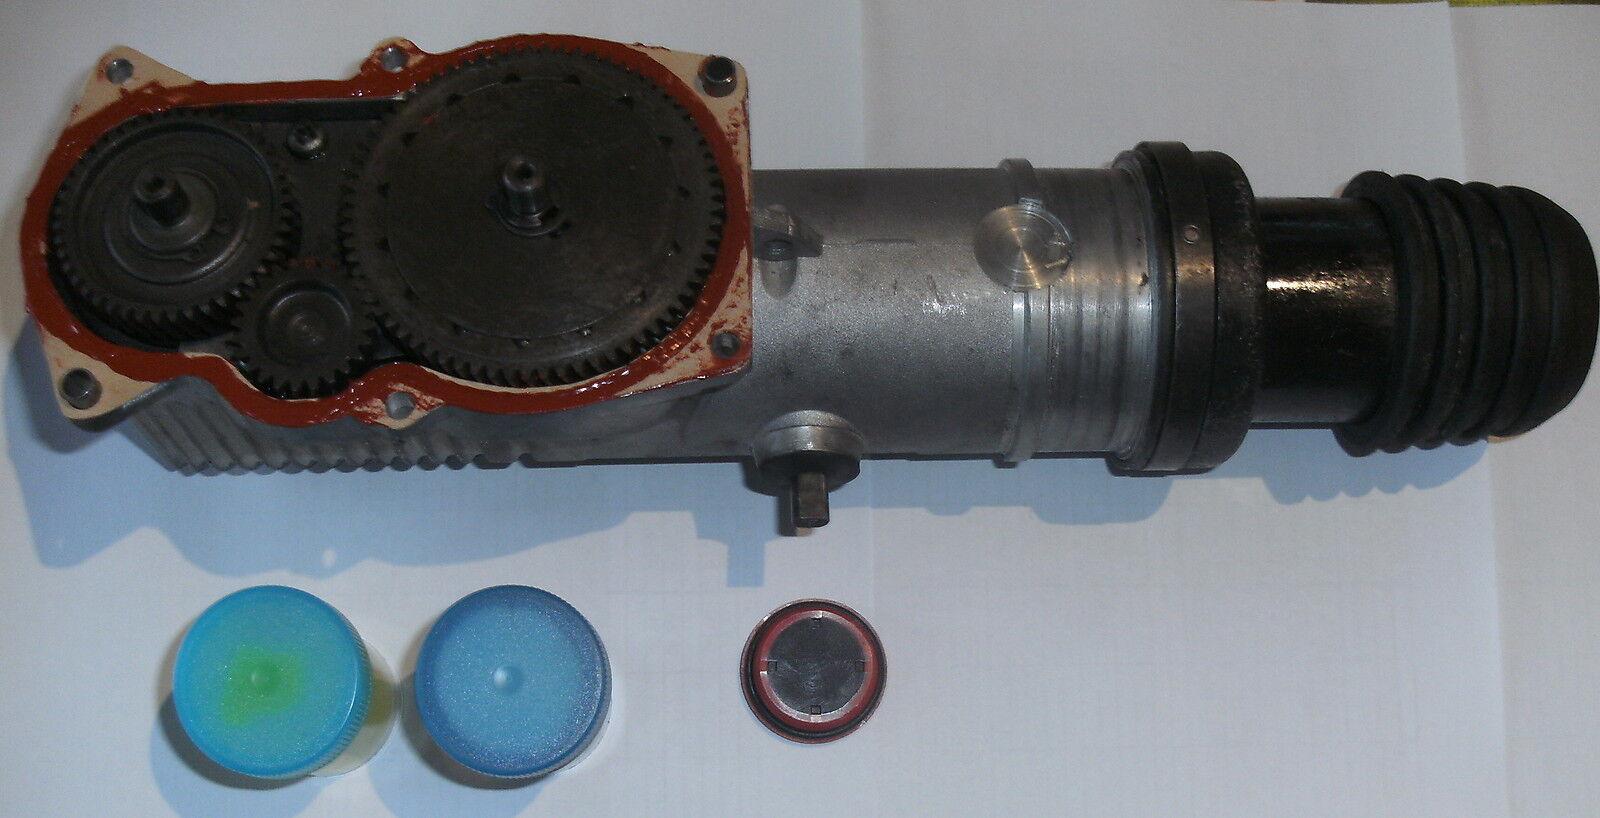 Hilti Te 52 Tauschgetriebe generalüberholt TE52 Garantie Te 42, TE-42, TE-52